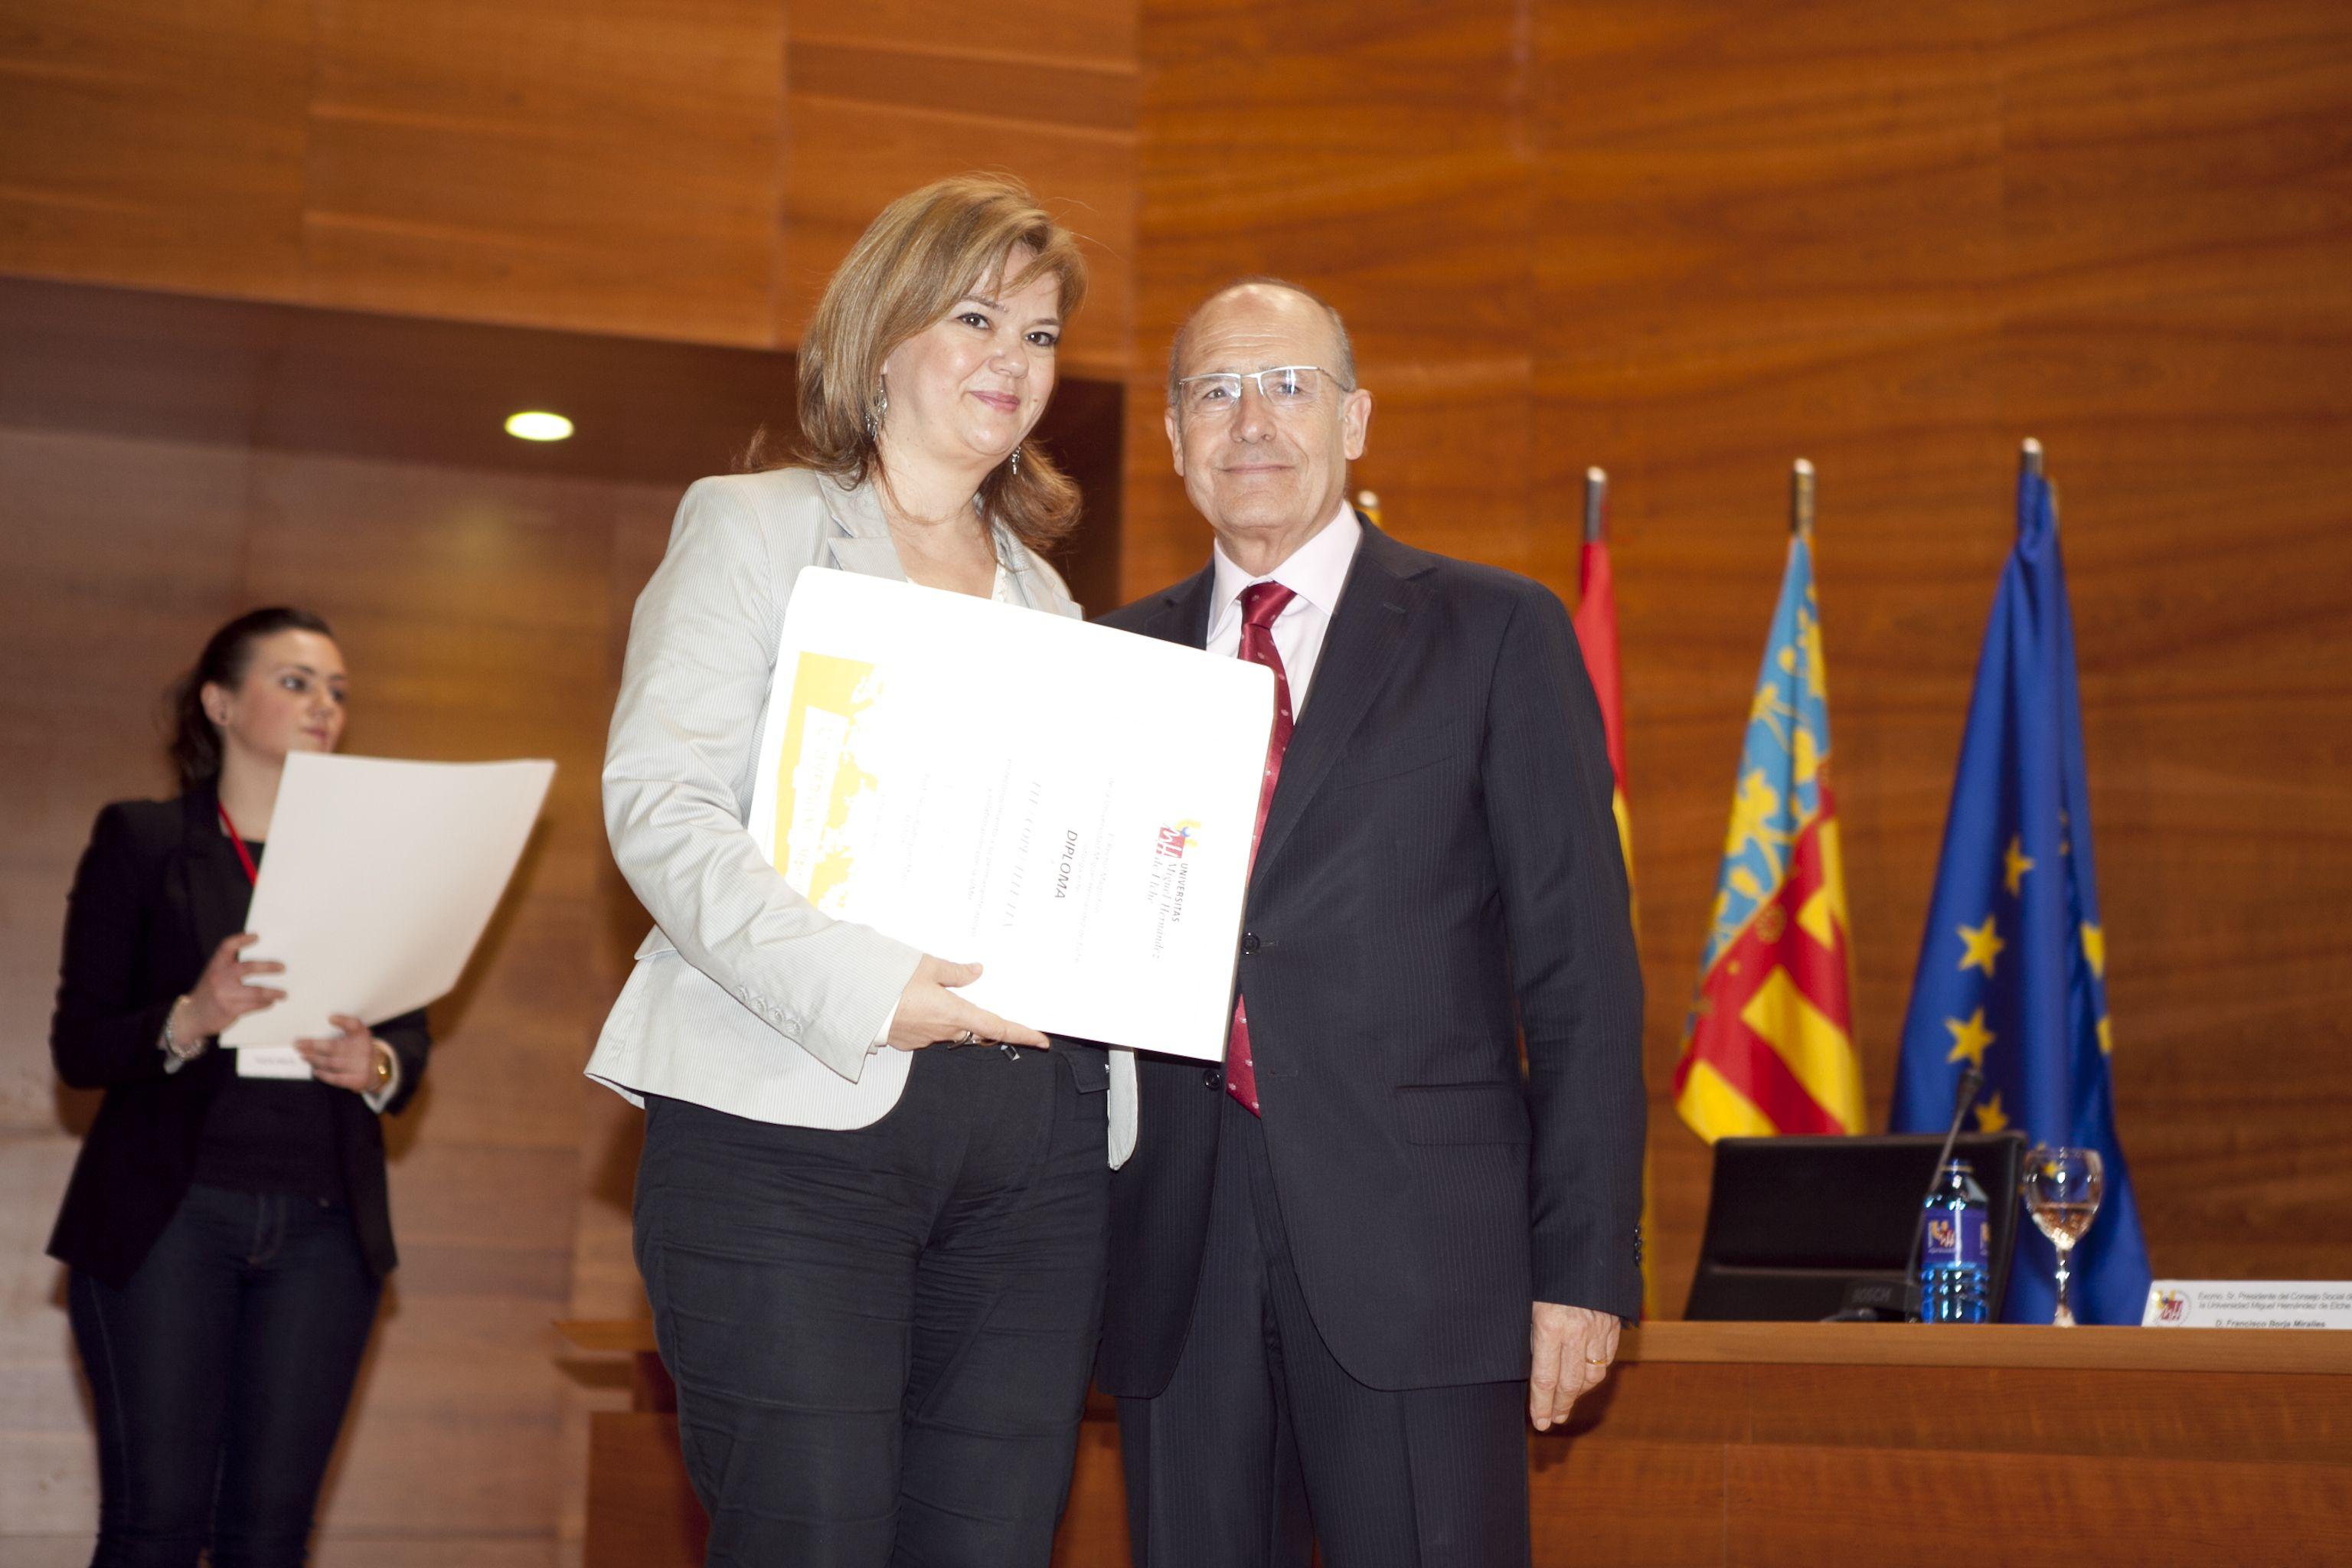 umh-diplomas-rector_mg_6857.jpg